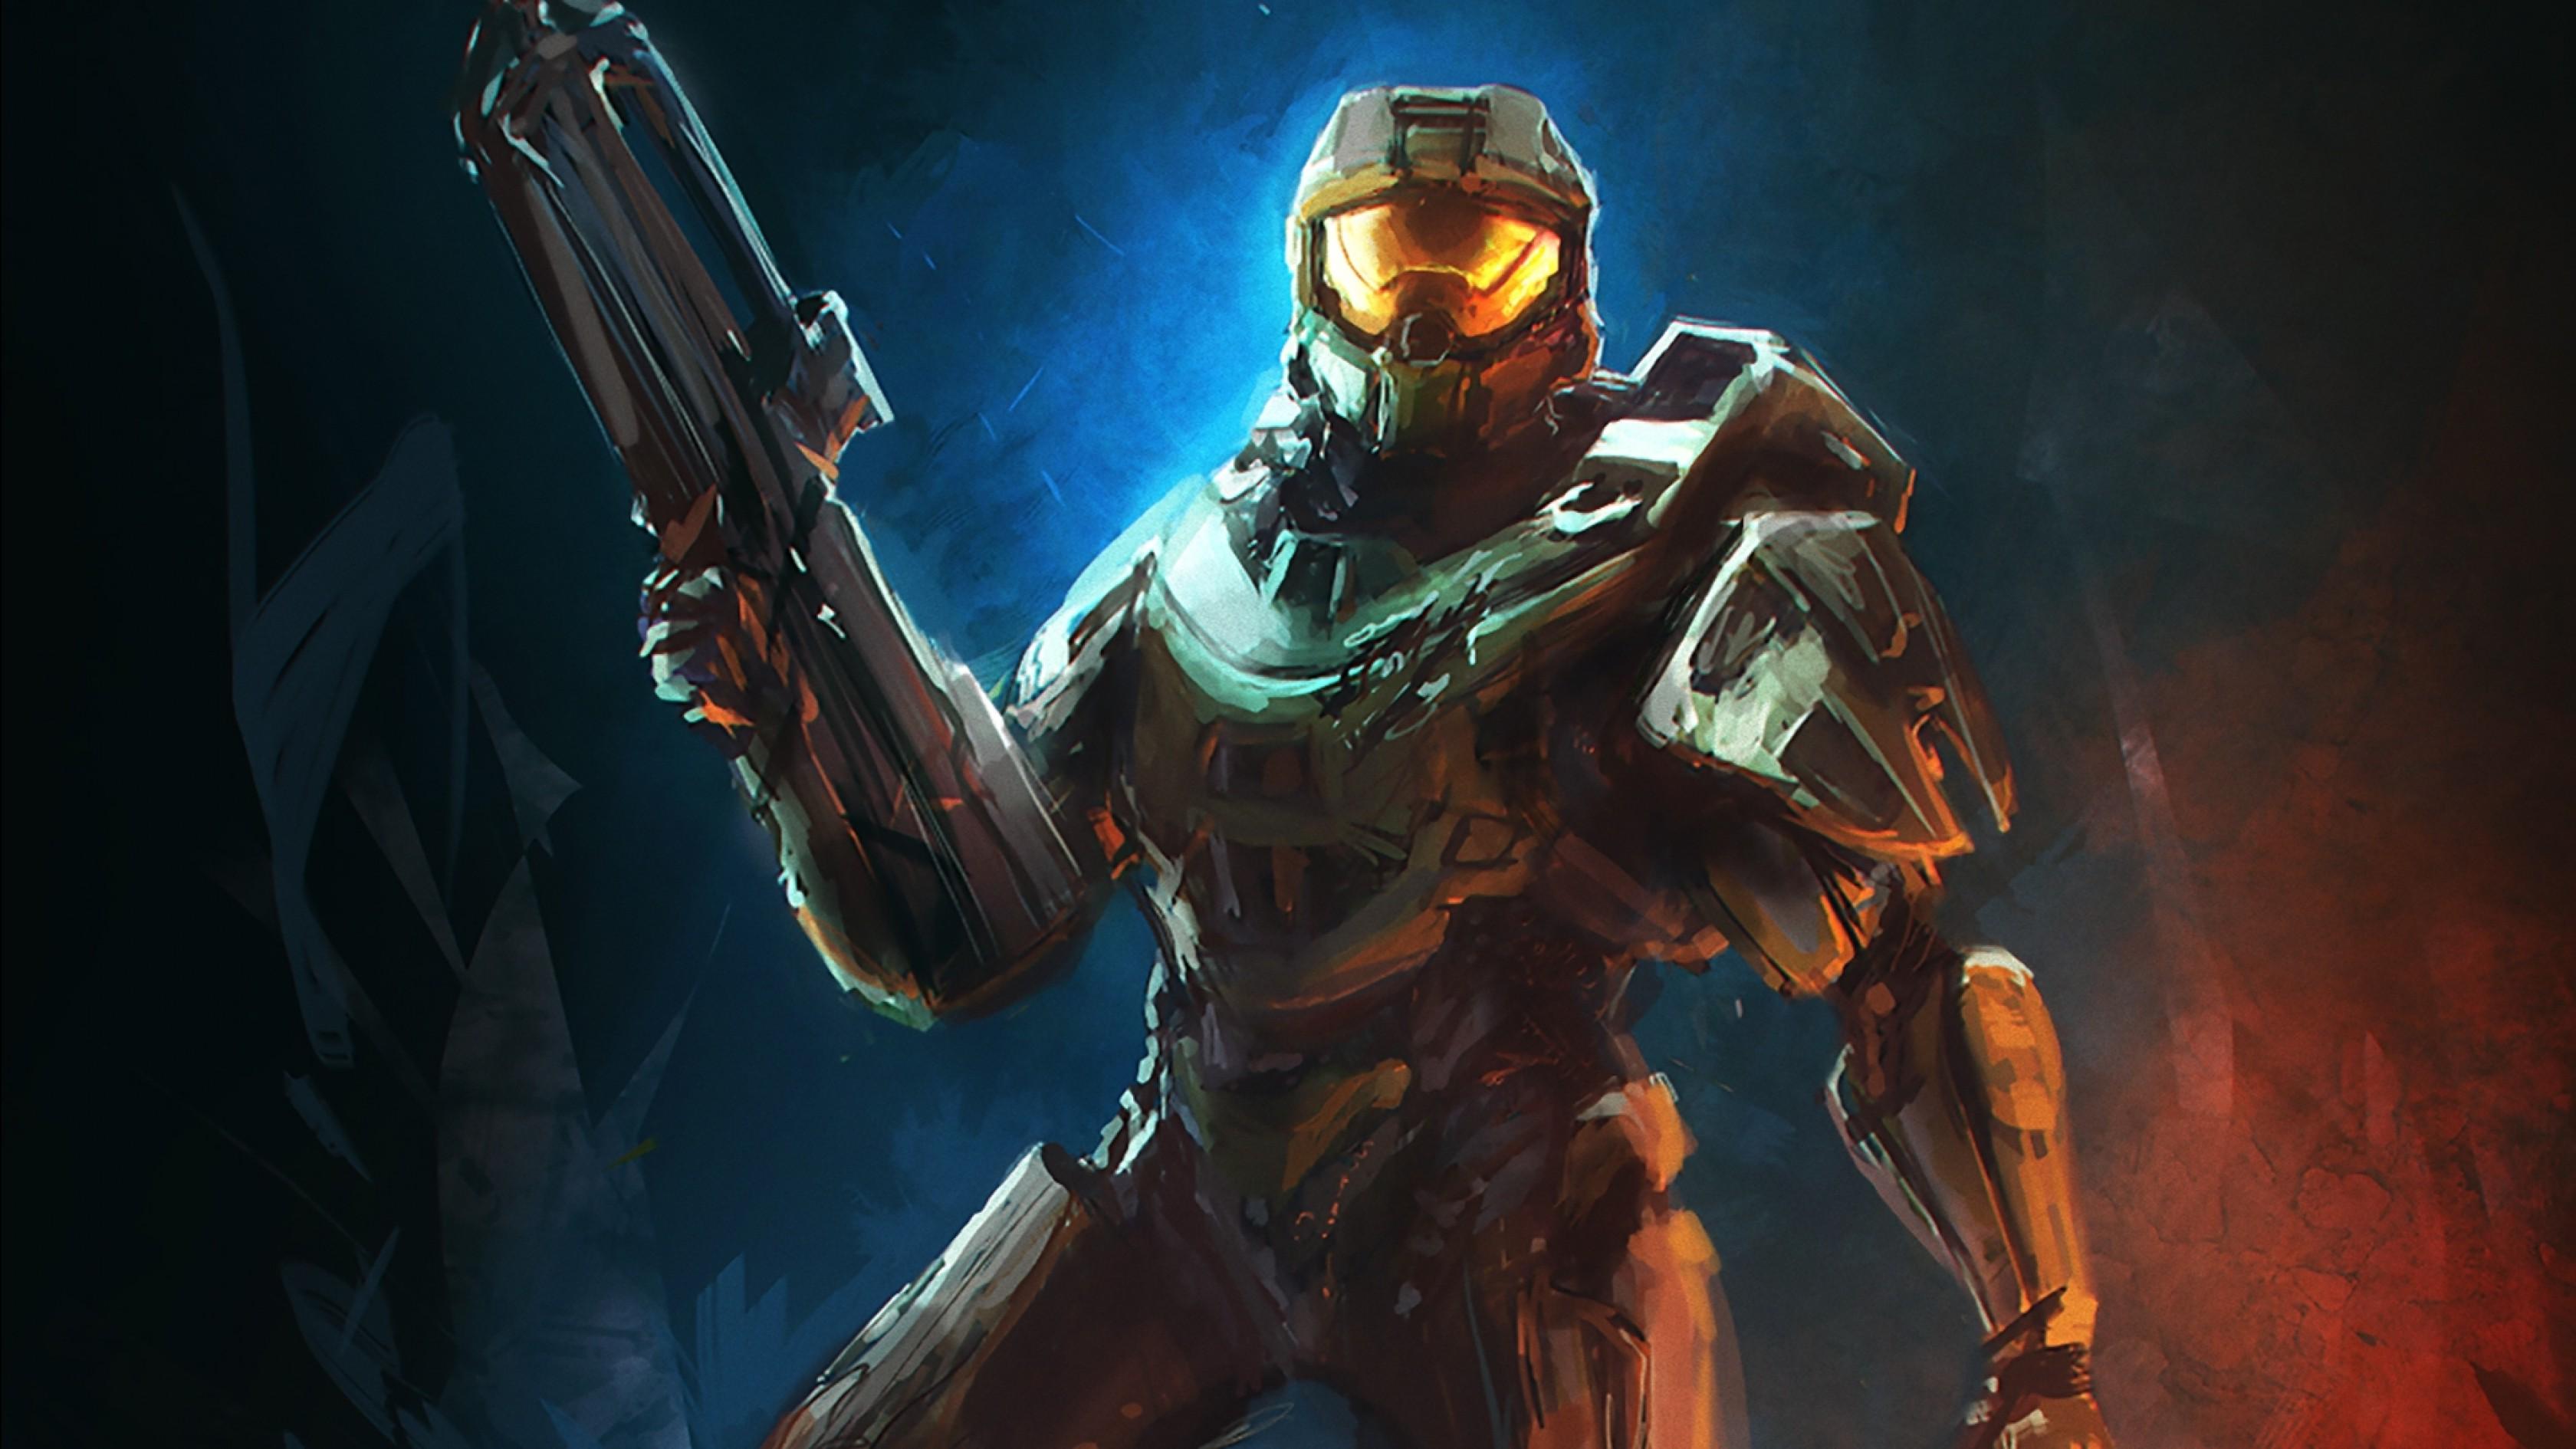 Wallpaper 3360x1890 Px Artwork Halo 4 Halo Master Chief